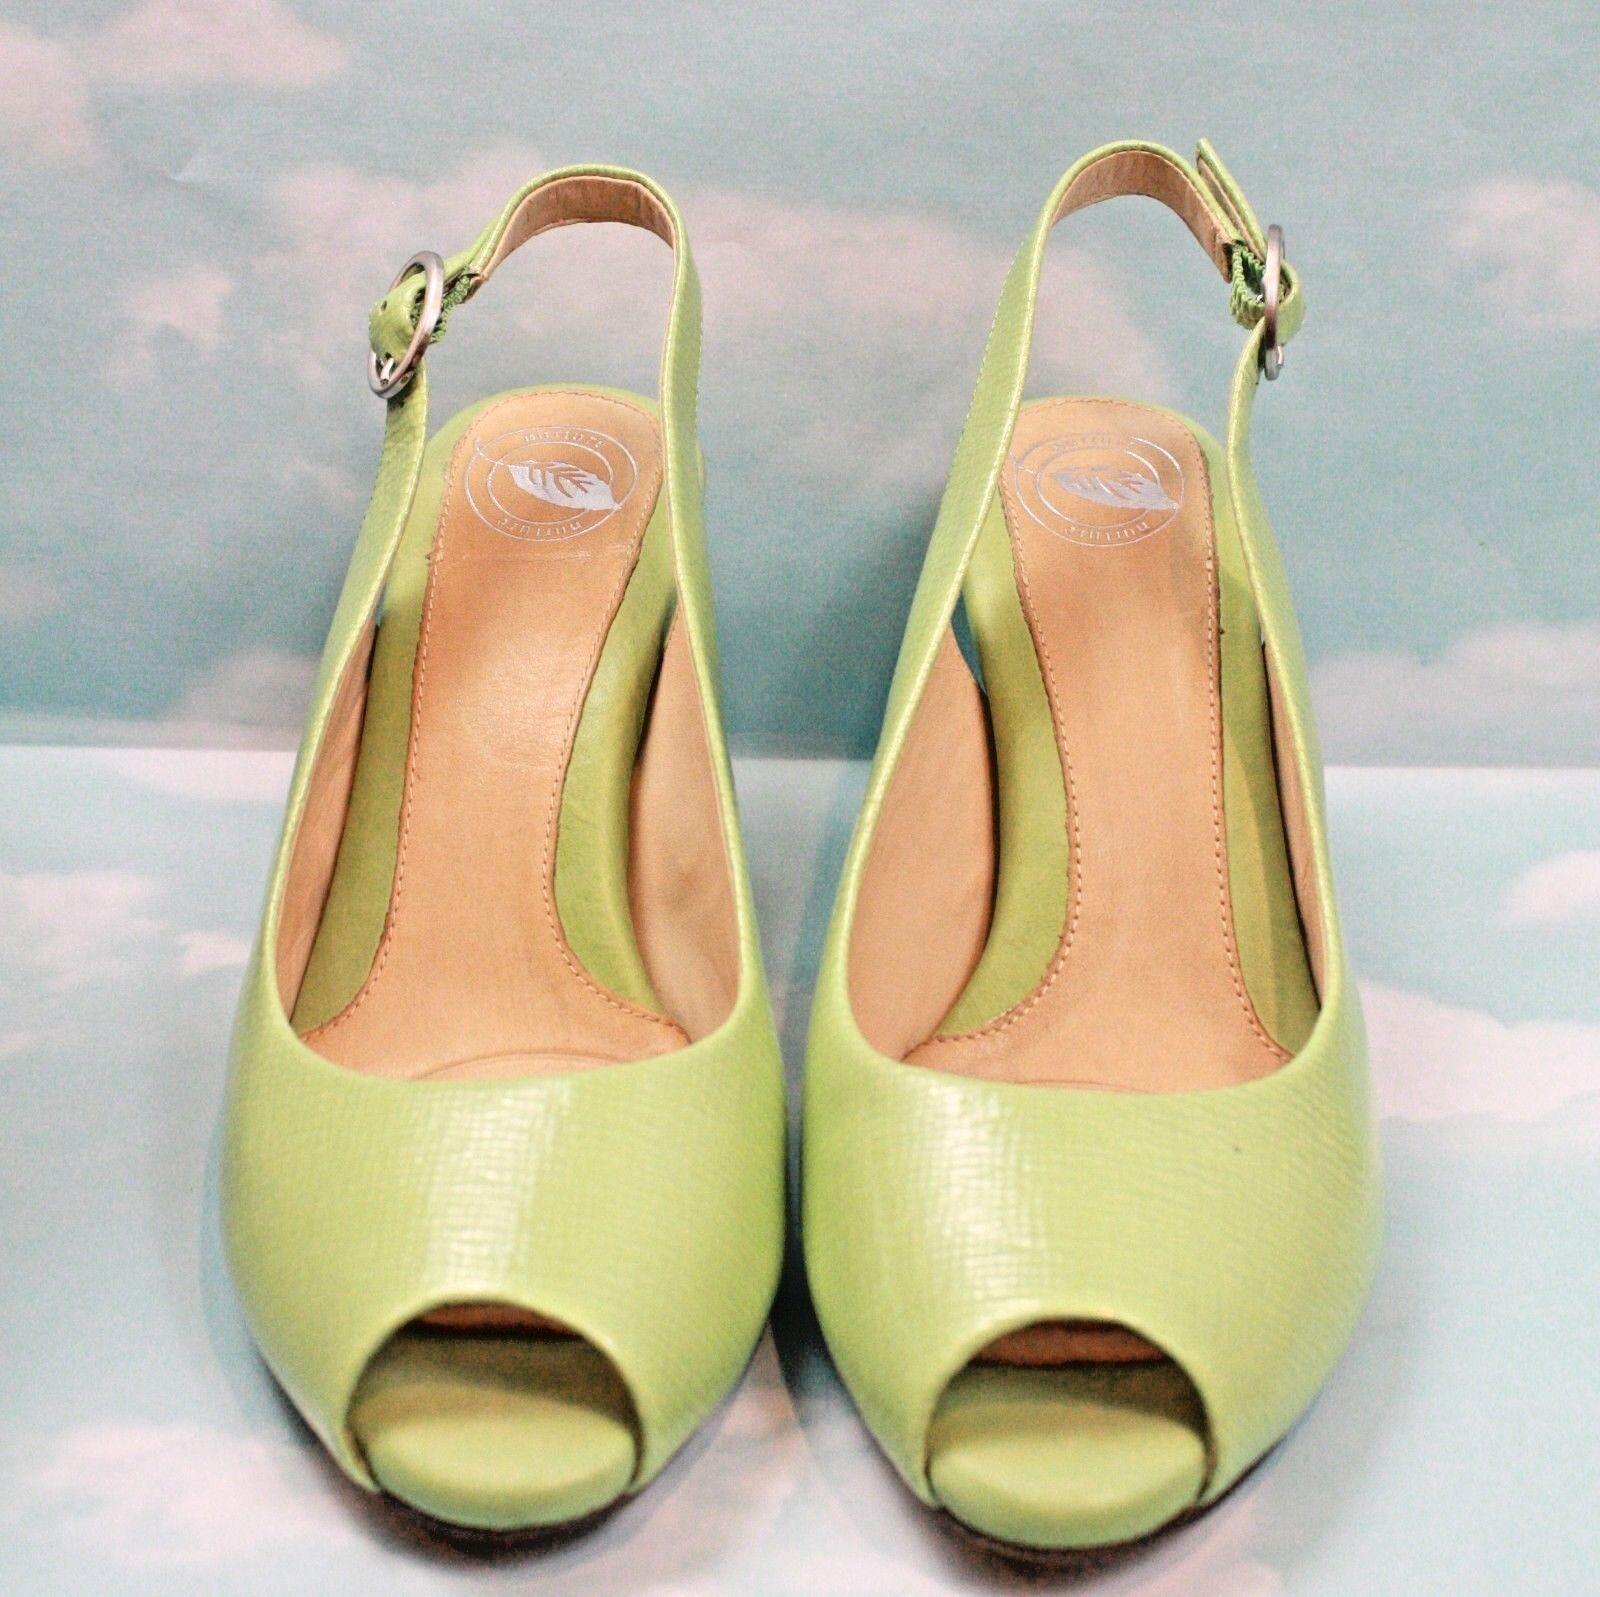 Nurture Women's Patent Green Leather Peep Toe Slingback Sandals, Mint Green Patent Size 6.5 37c4e3